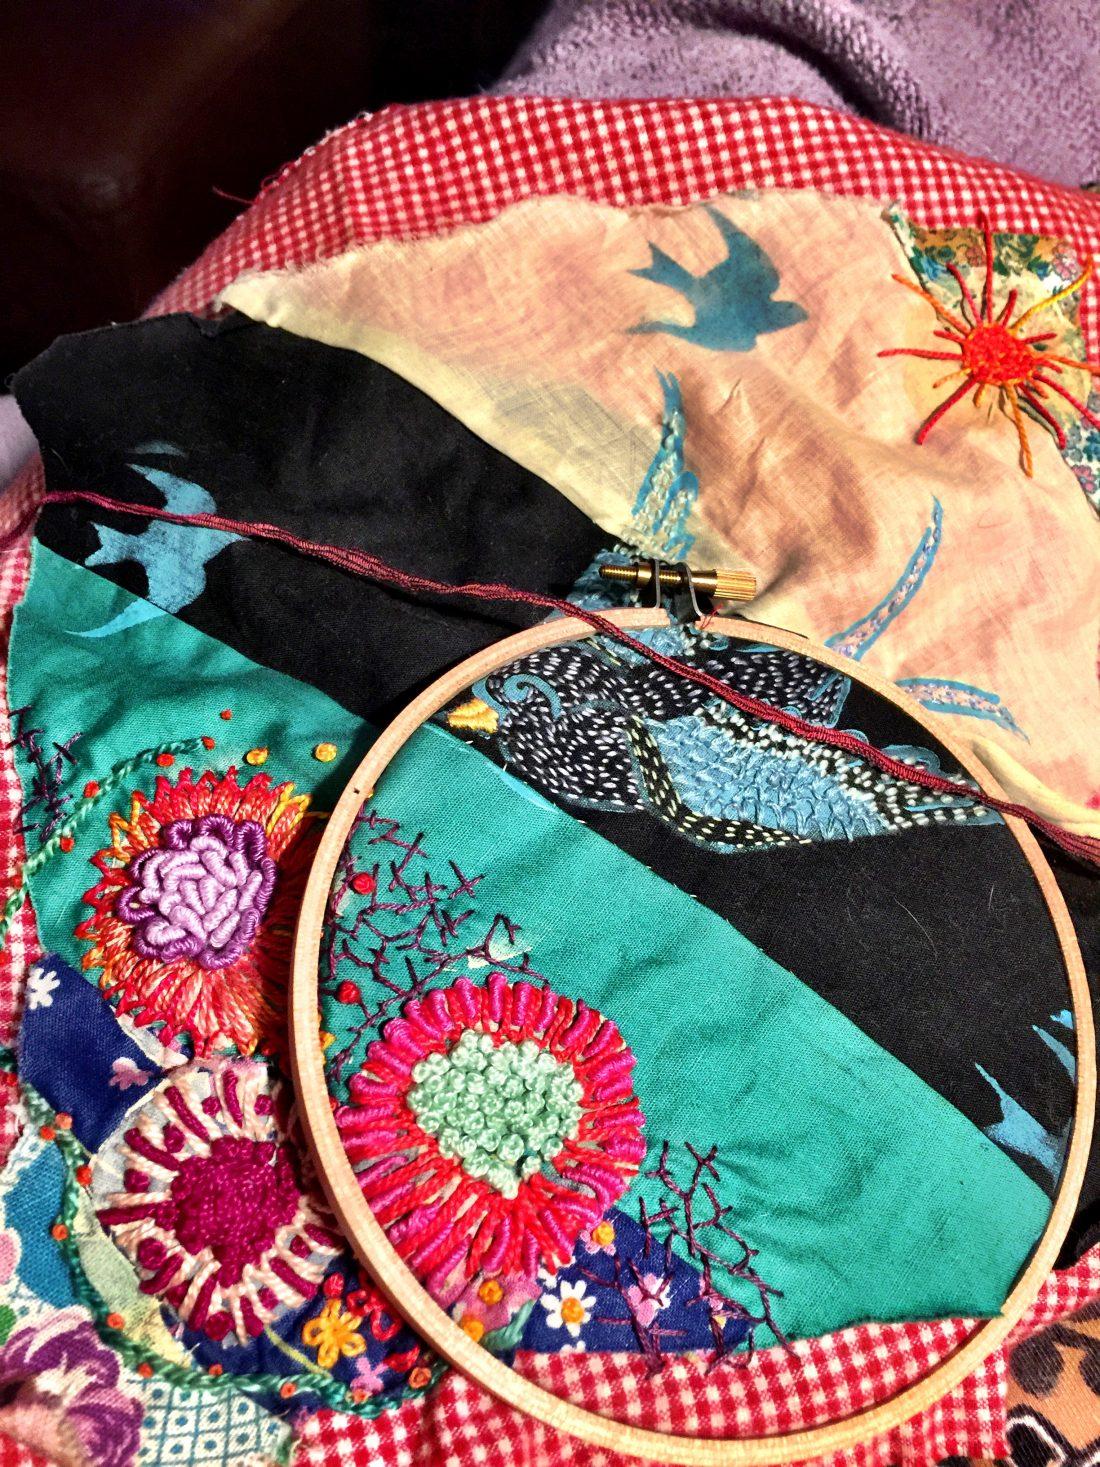 Stitching with Kristin